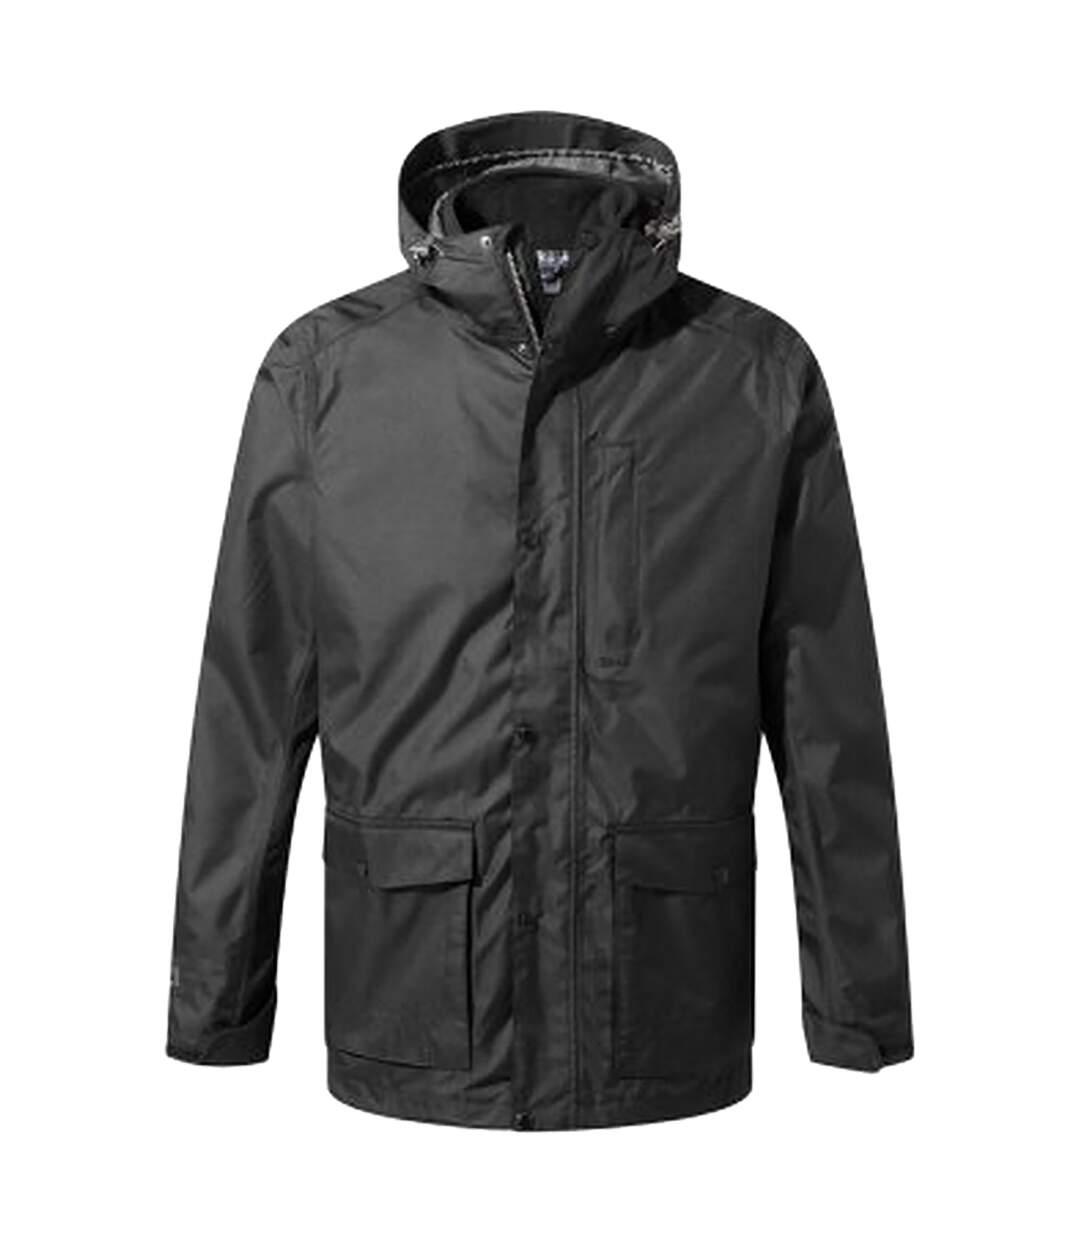 Craghoppers Mens Expert Kiwi 3 In 1 Jacket (Black) - UTPC3189